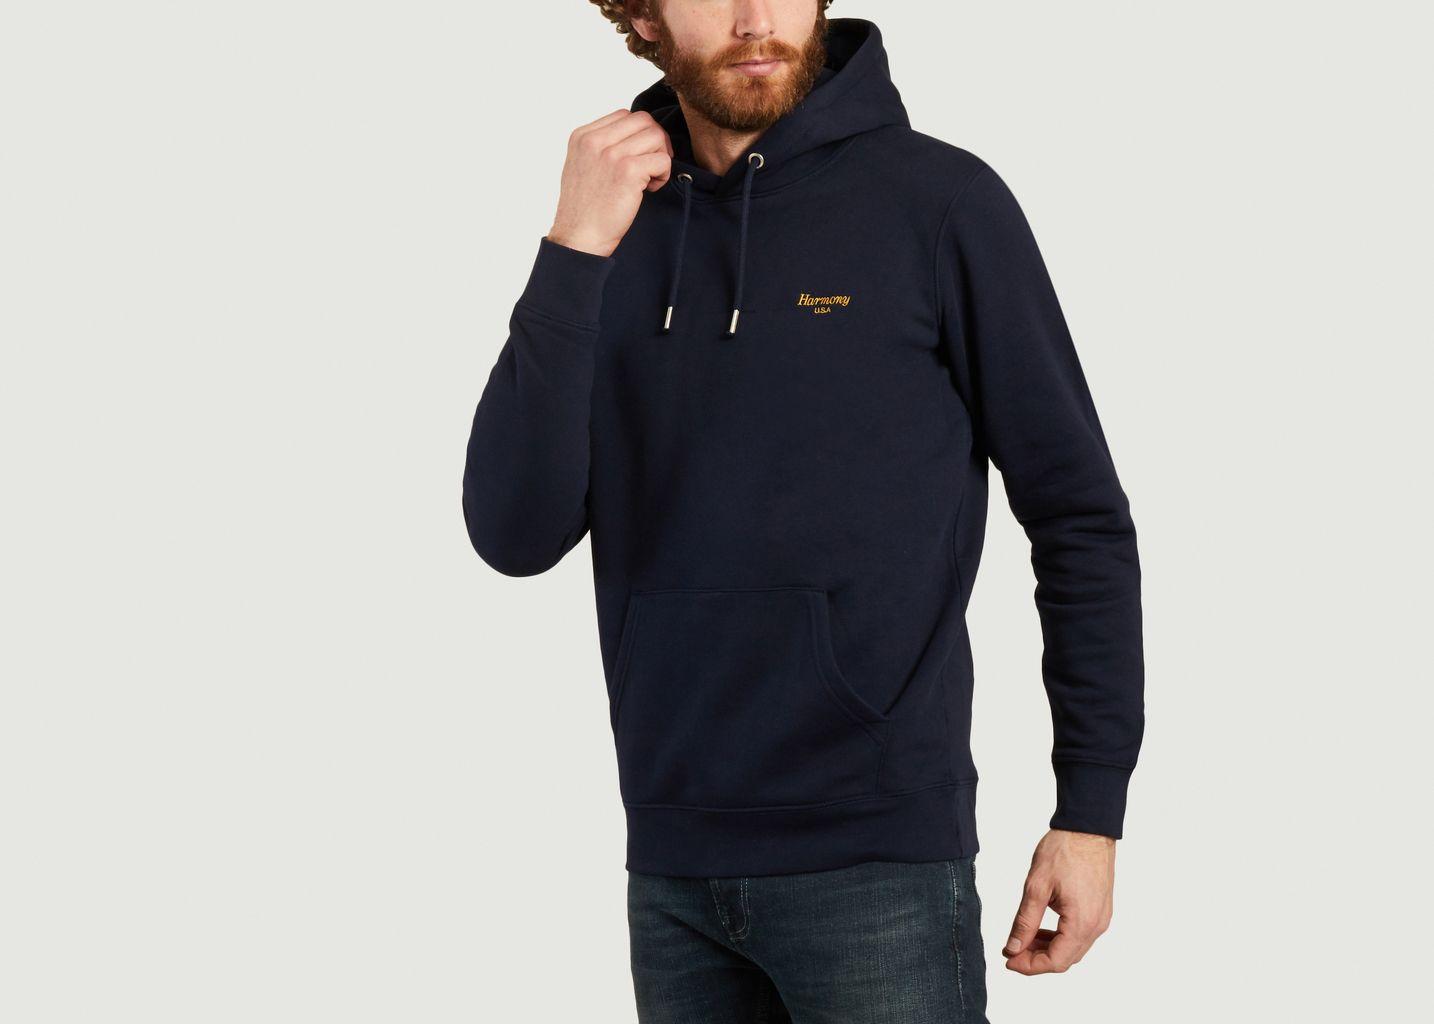 Sweatshirt à capuche Italique - Harmony